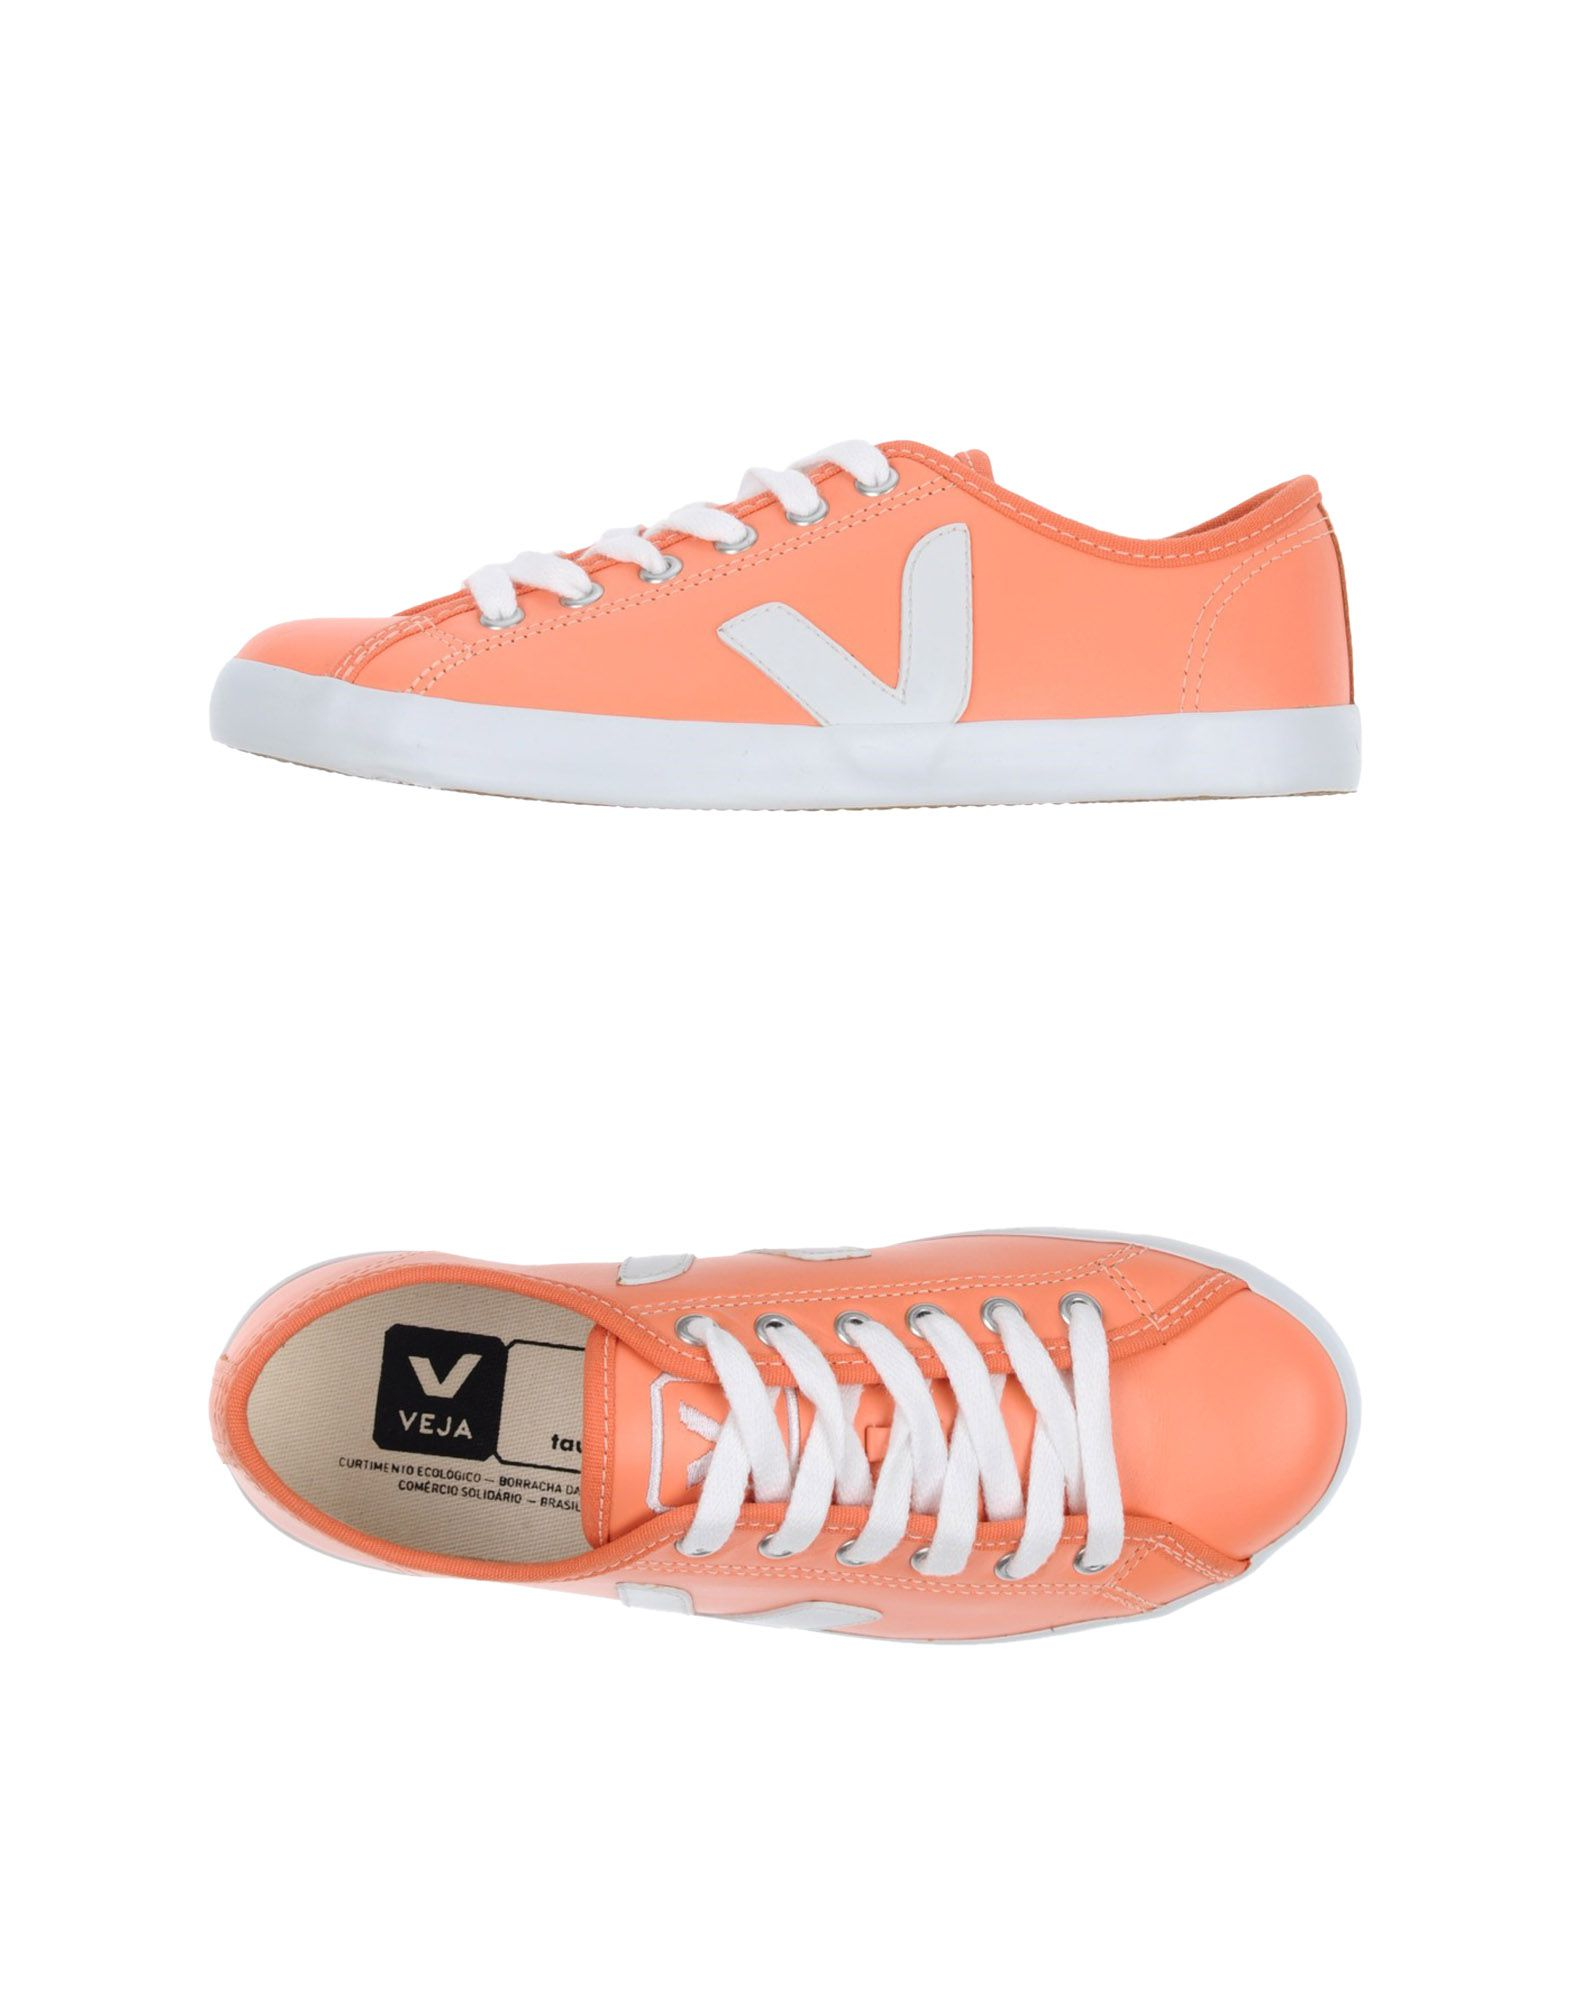 Veja Sneakers In Salmon Pink | ModeSens